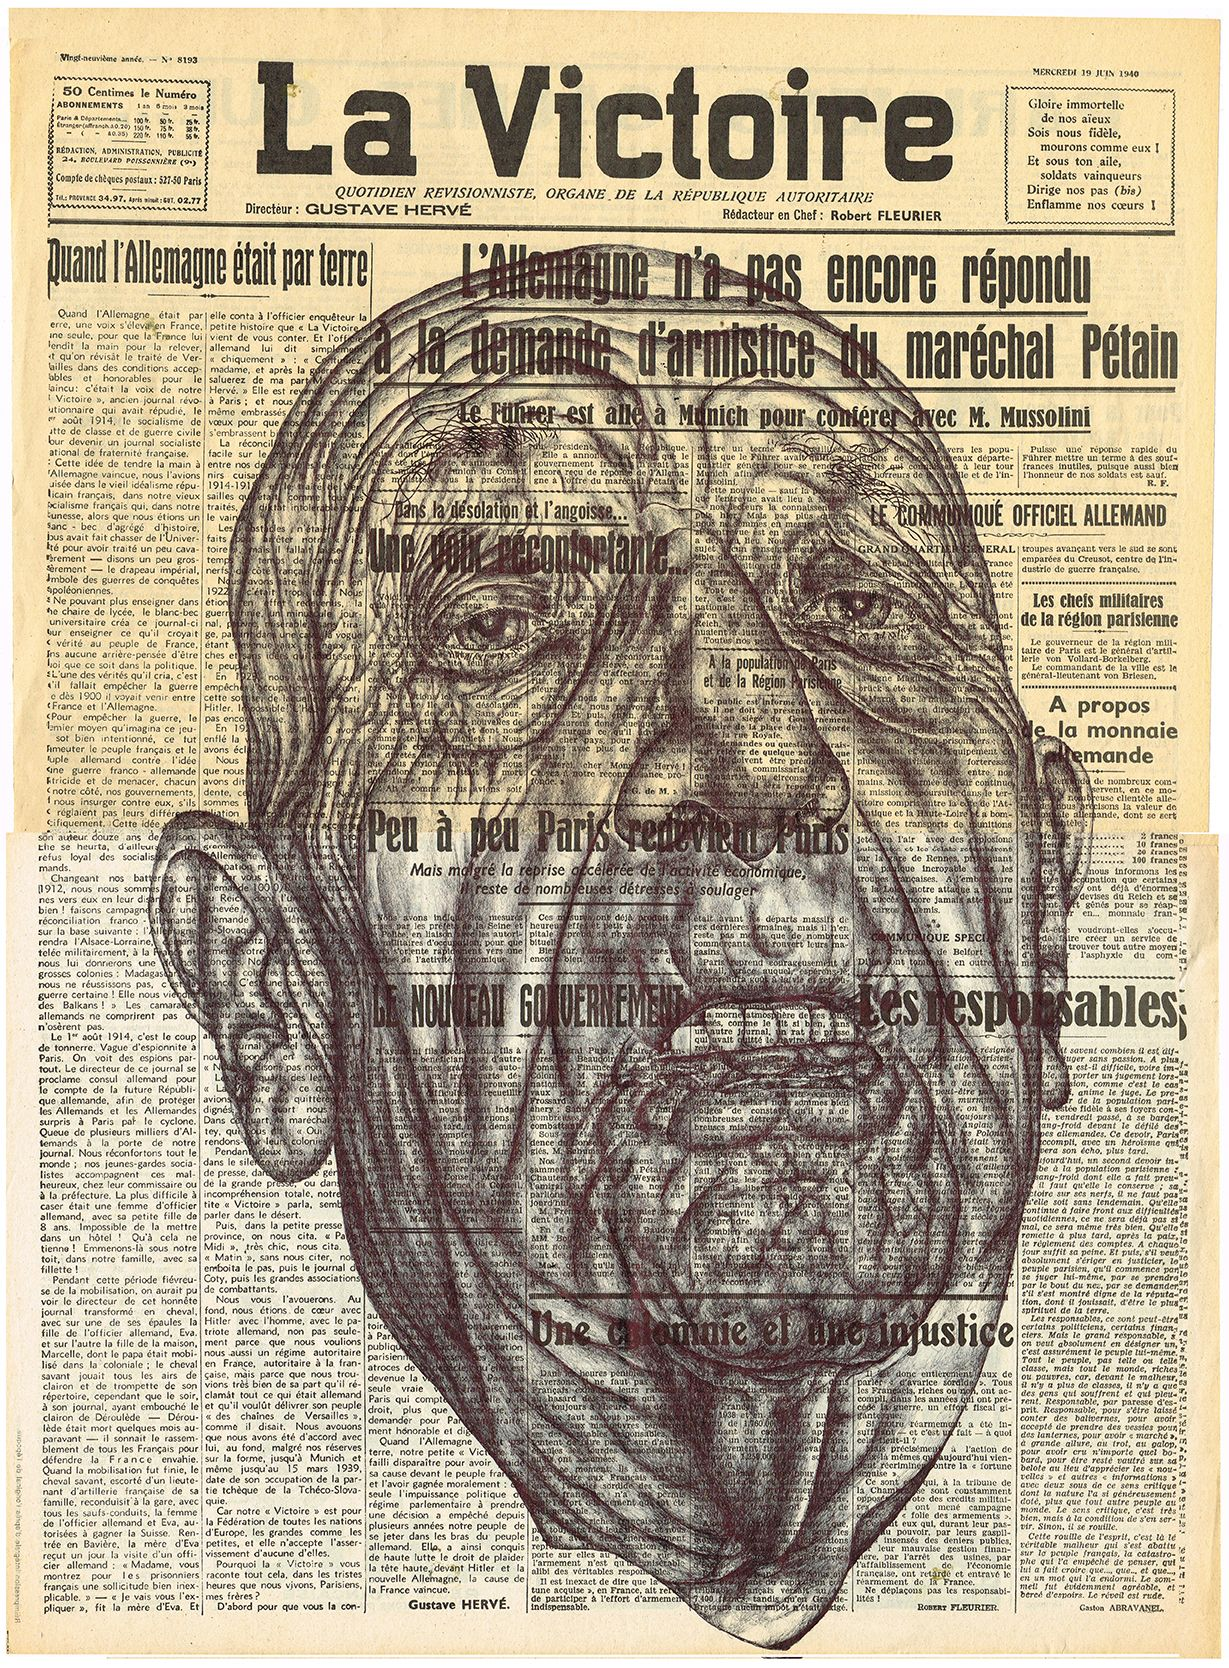 Biro Pen Portrait Google Search Bic Biro Biro Drawing Biro Art